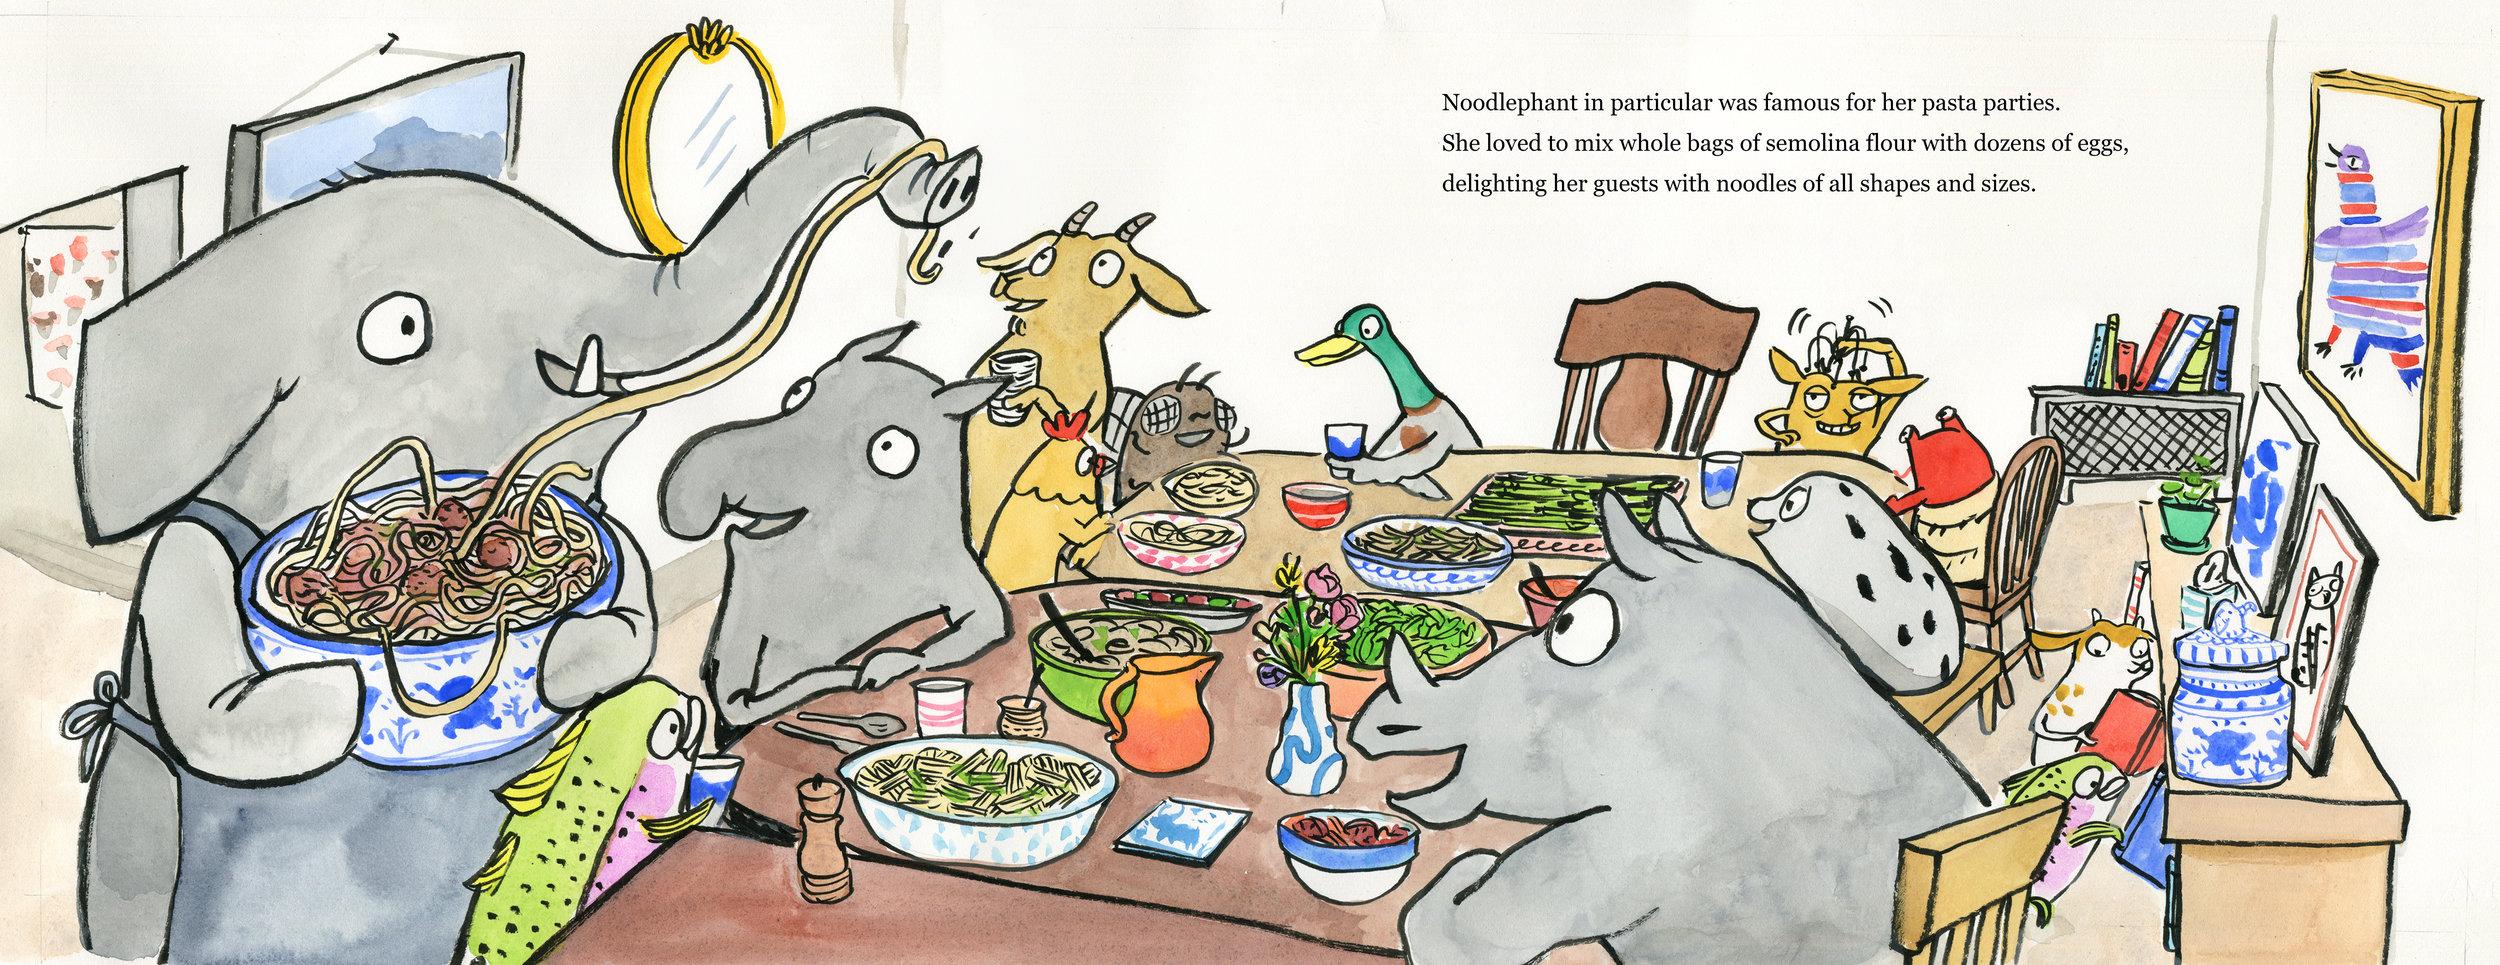 noodlephant-dinner-party.jpg